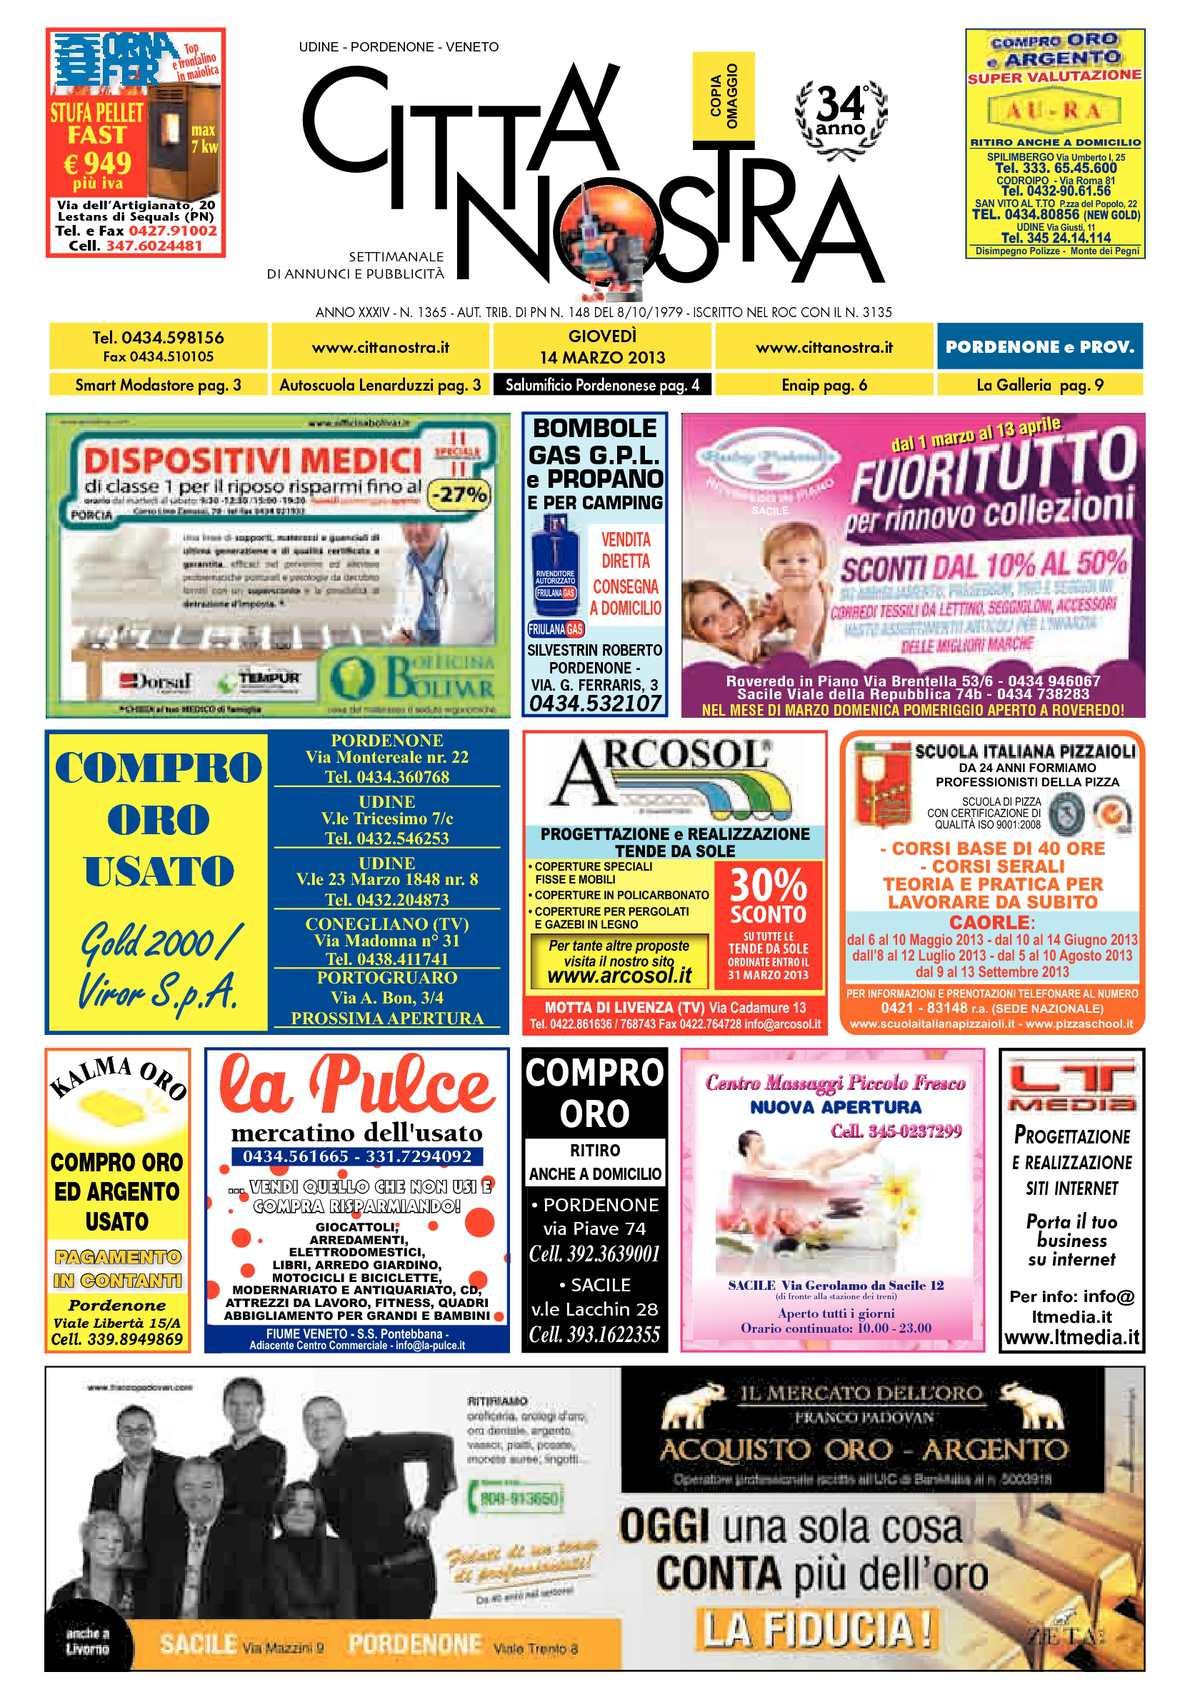 best authentic a0639 48a6c Calaméo - Città Nostra Pordenone del 14.03.2013 n. 1365